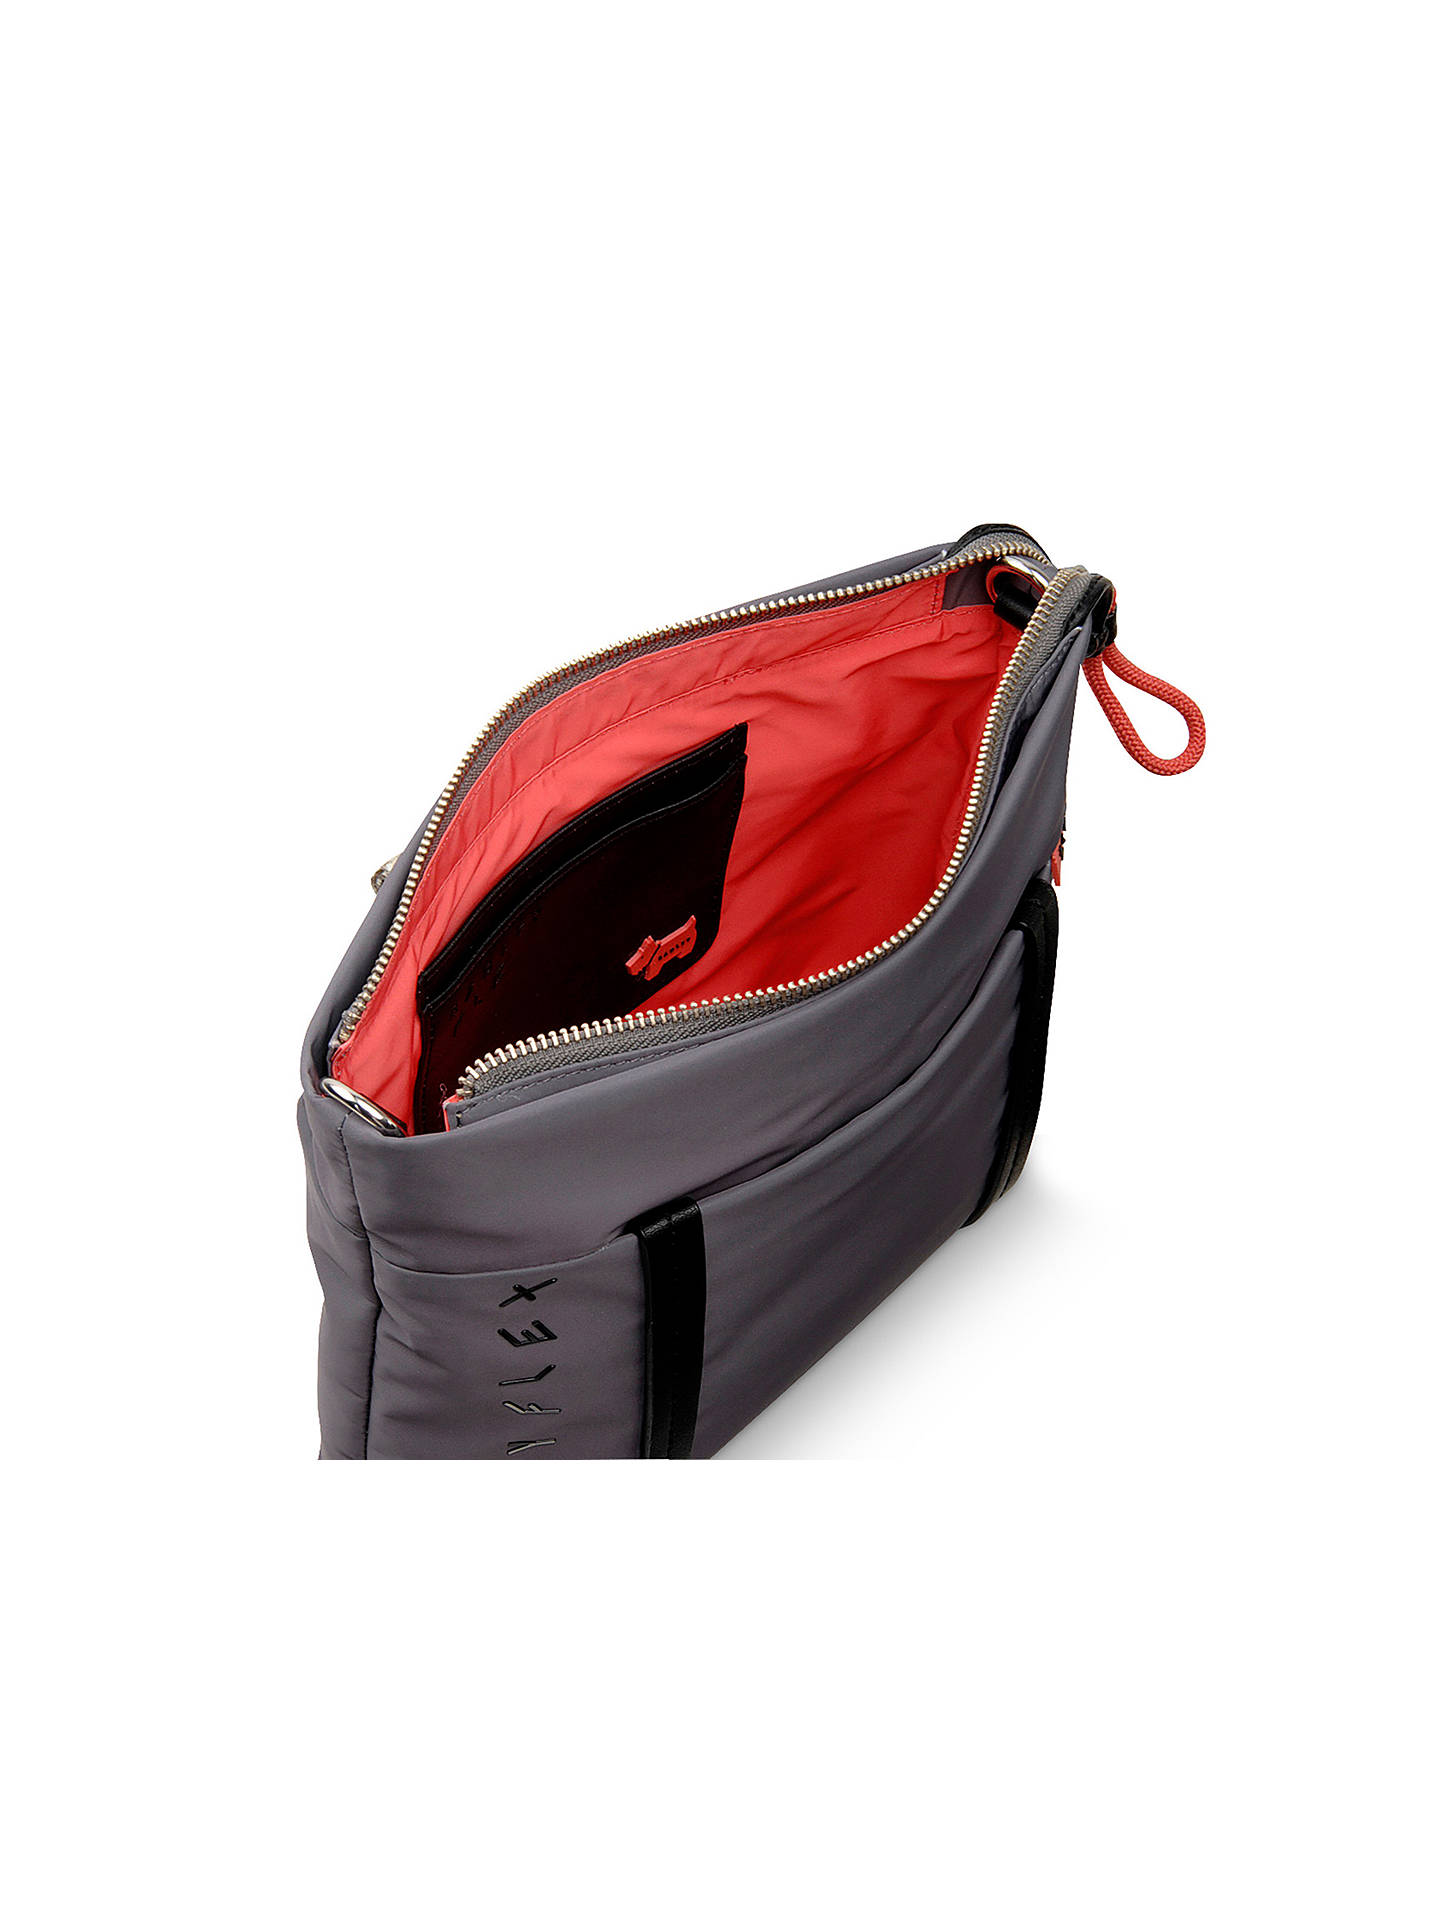 a0bca89e038a Radley Flex Small Zip Top Cross Body Bag at John Lewis   Partners